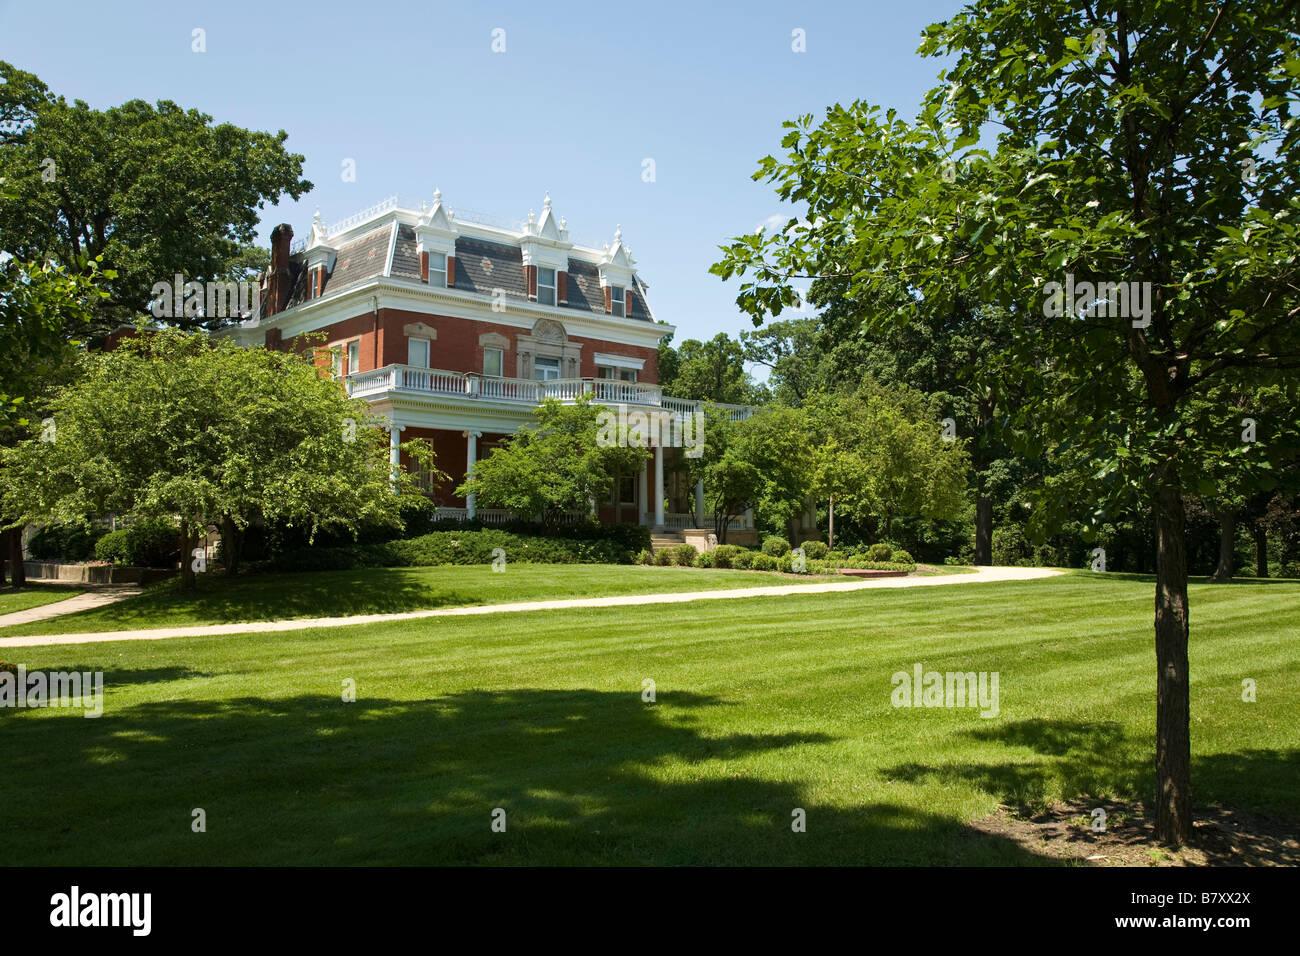 Incredible Illinois Dekalb Exterior Of Ellwood House And Museum Built Download Free Architecture Designs Sospemadebymaigaardcom